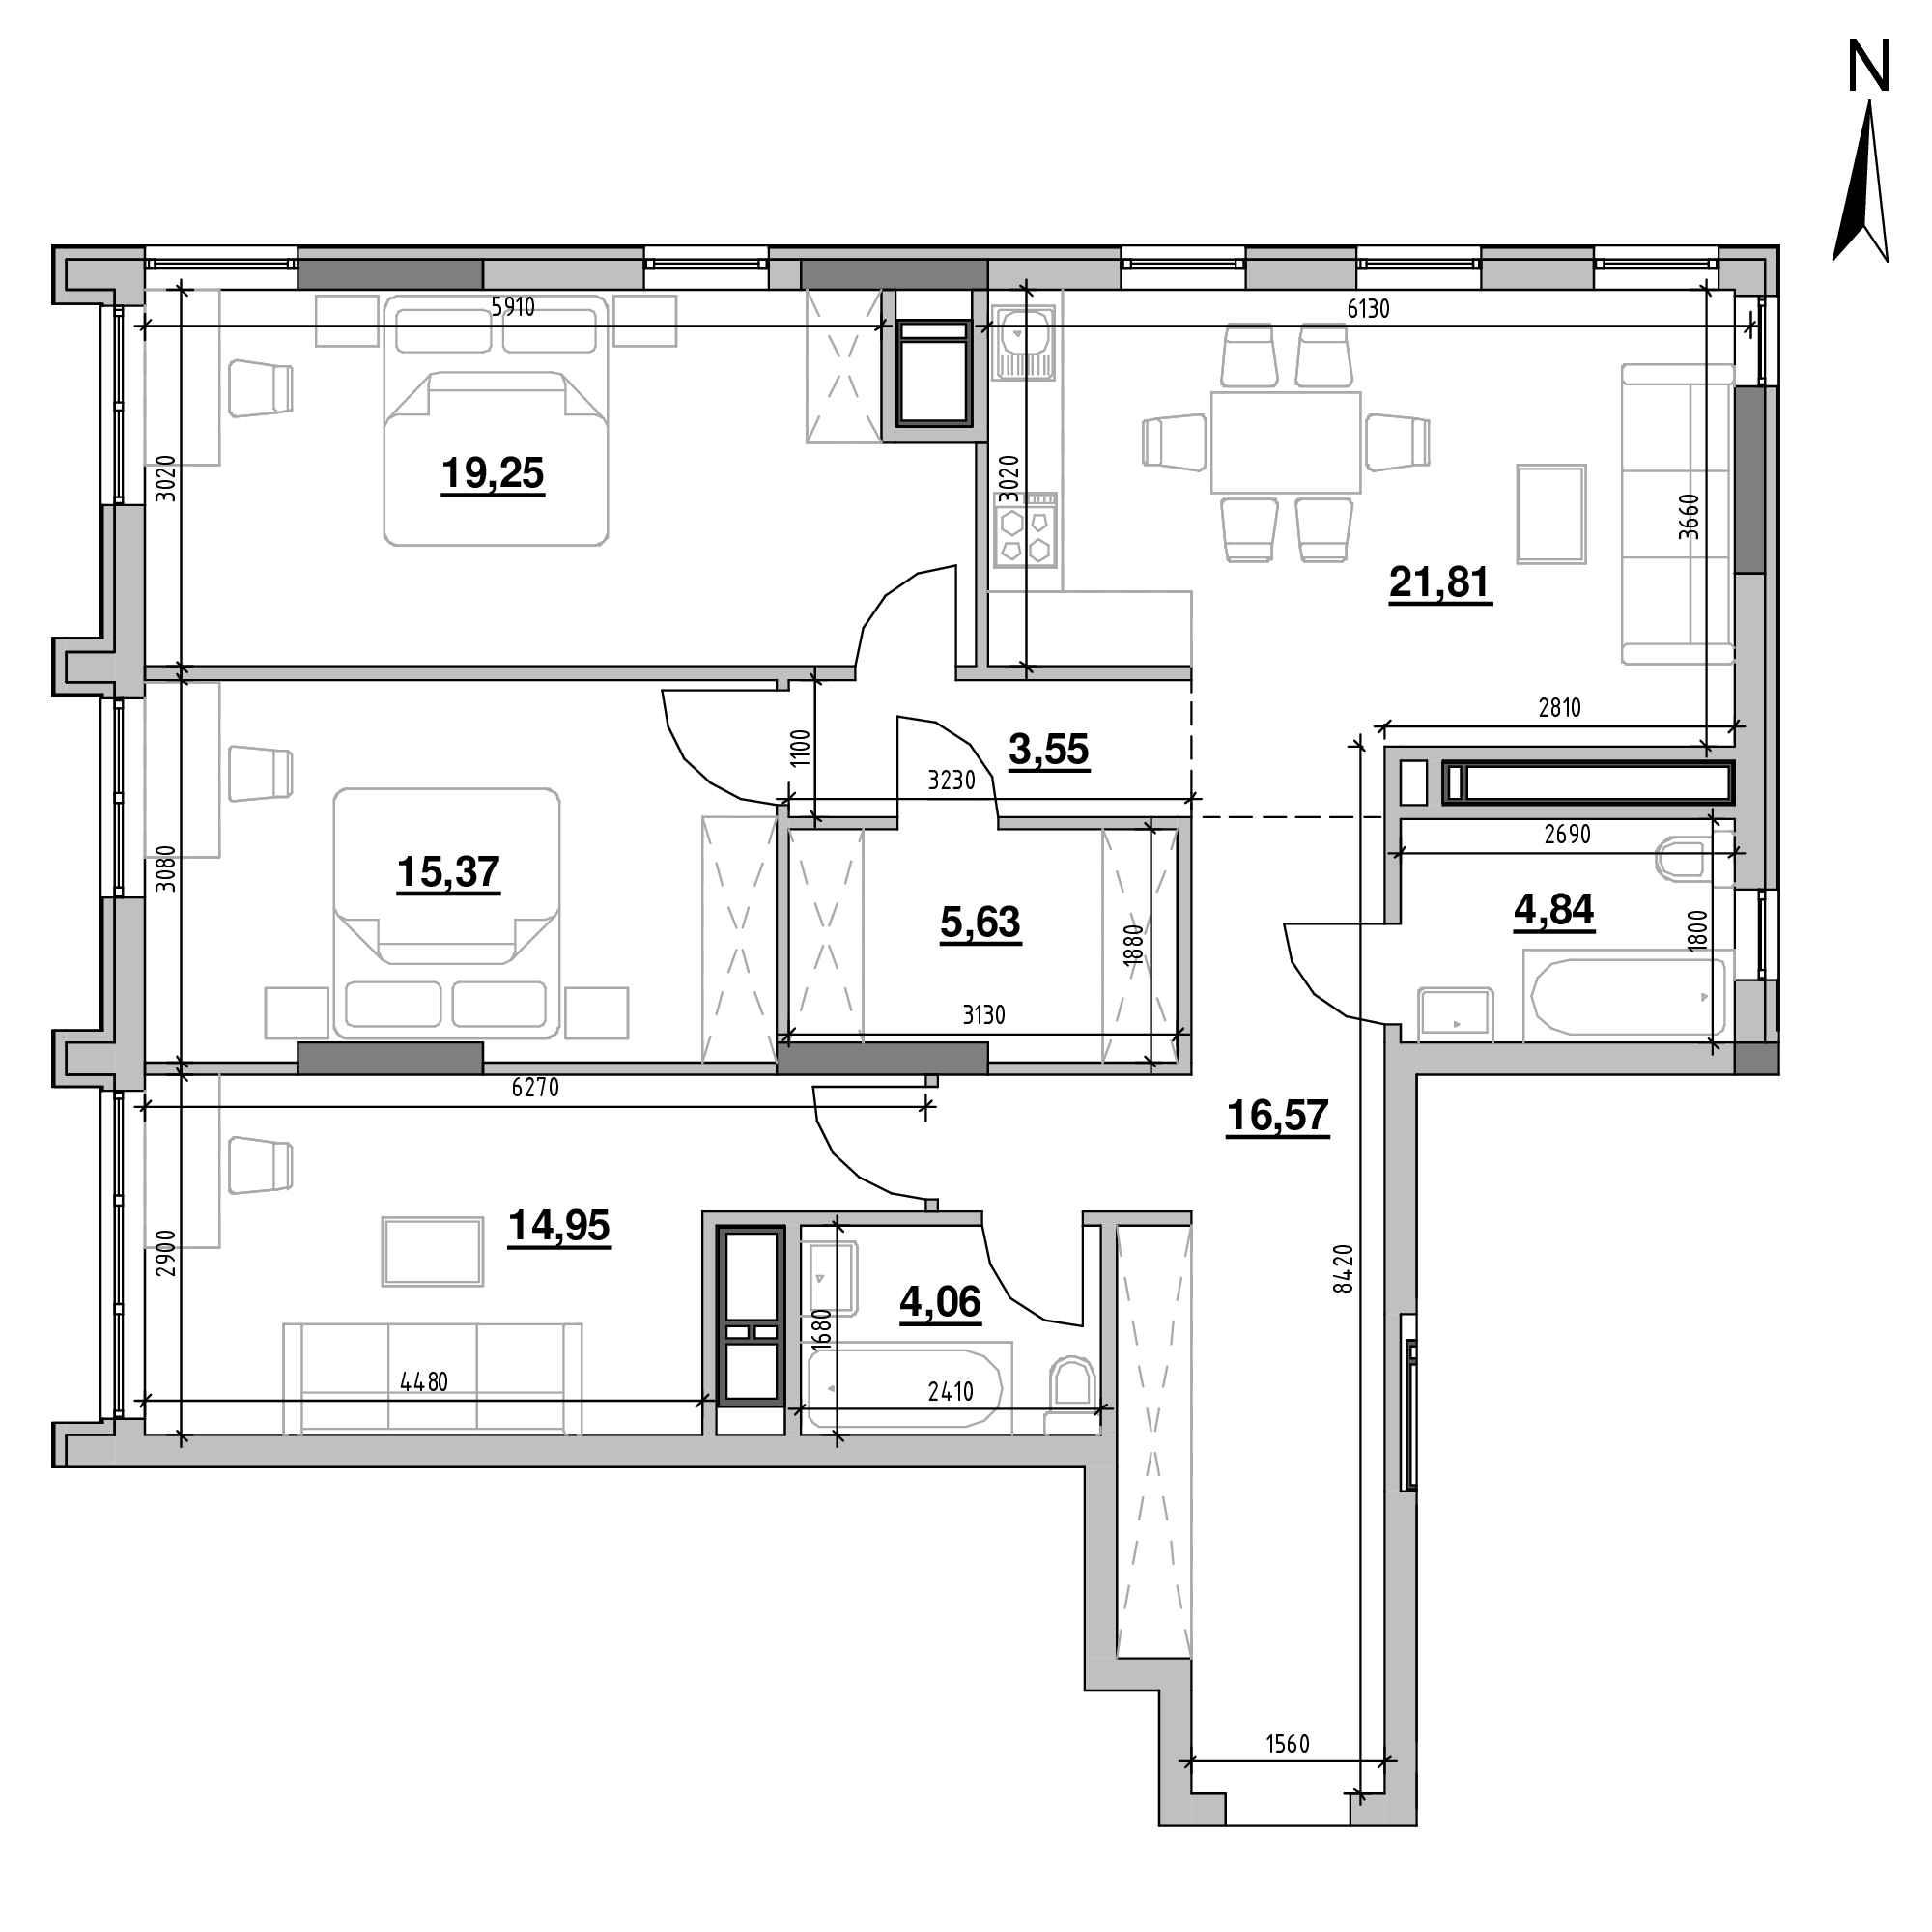 ЖК Nordica Residence: планування 1-кімнатної квартири, №151, 40.97 м<sup>2</sup>